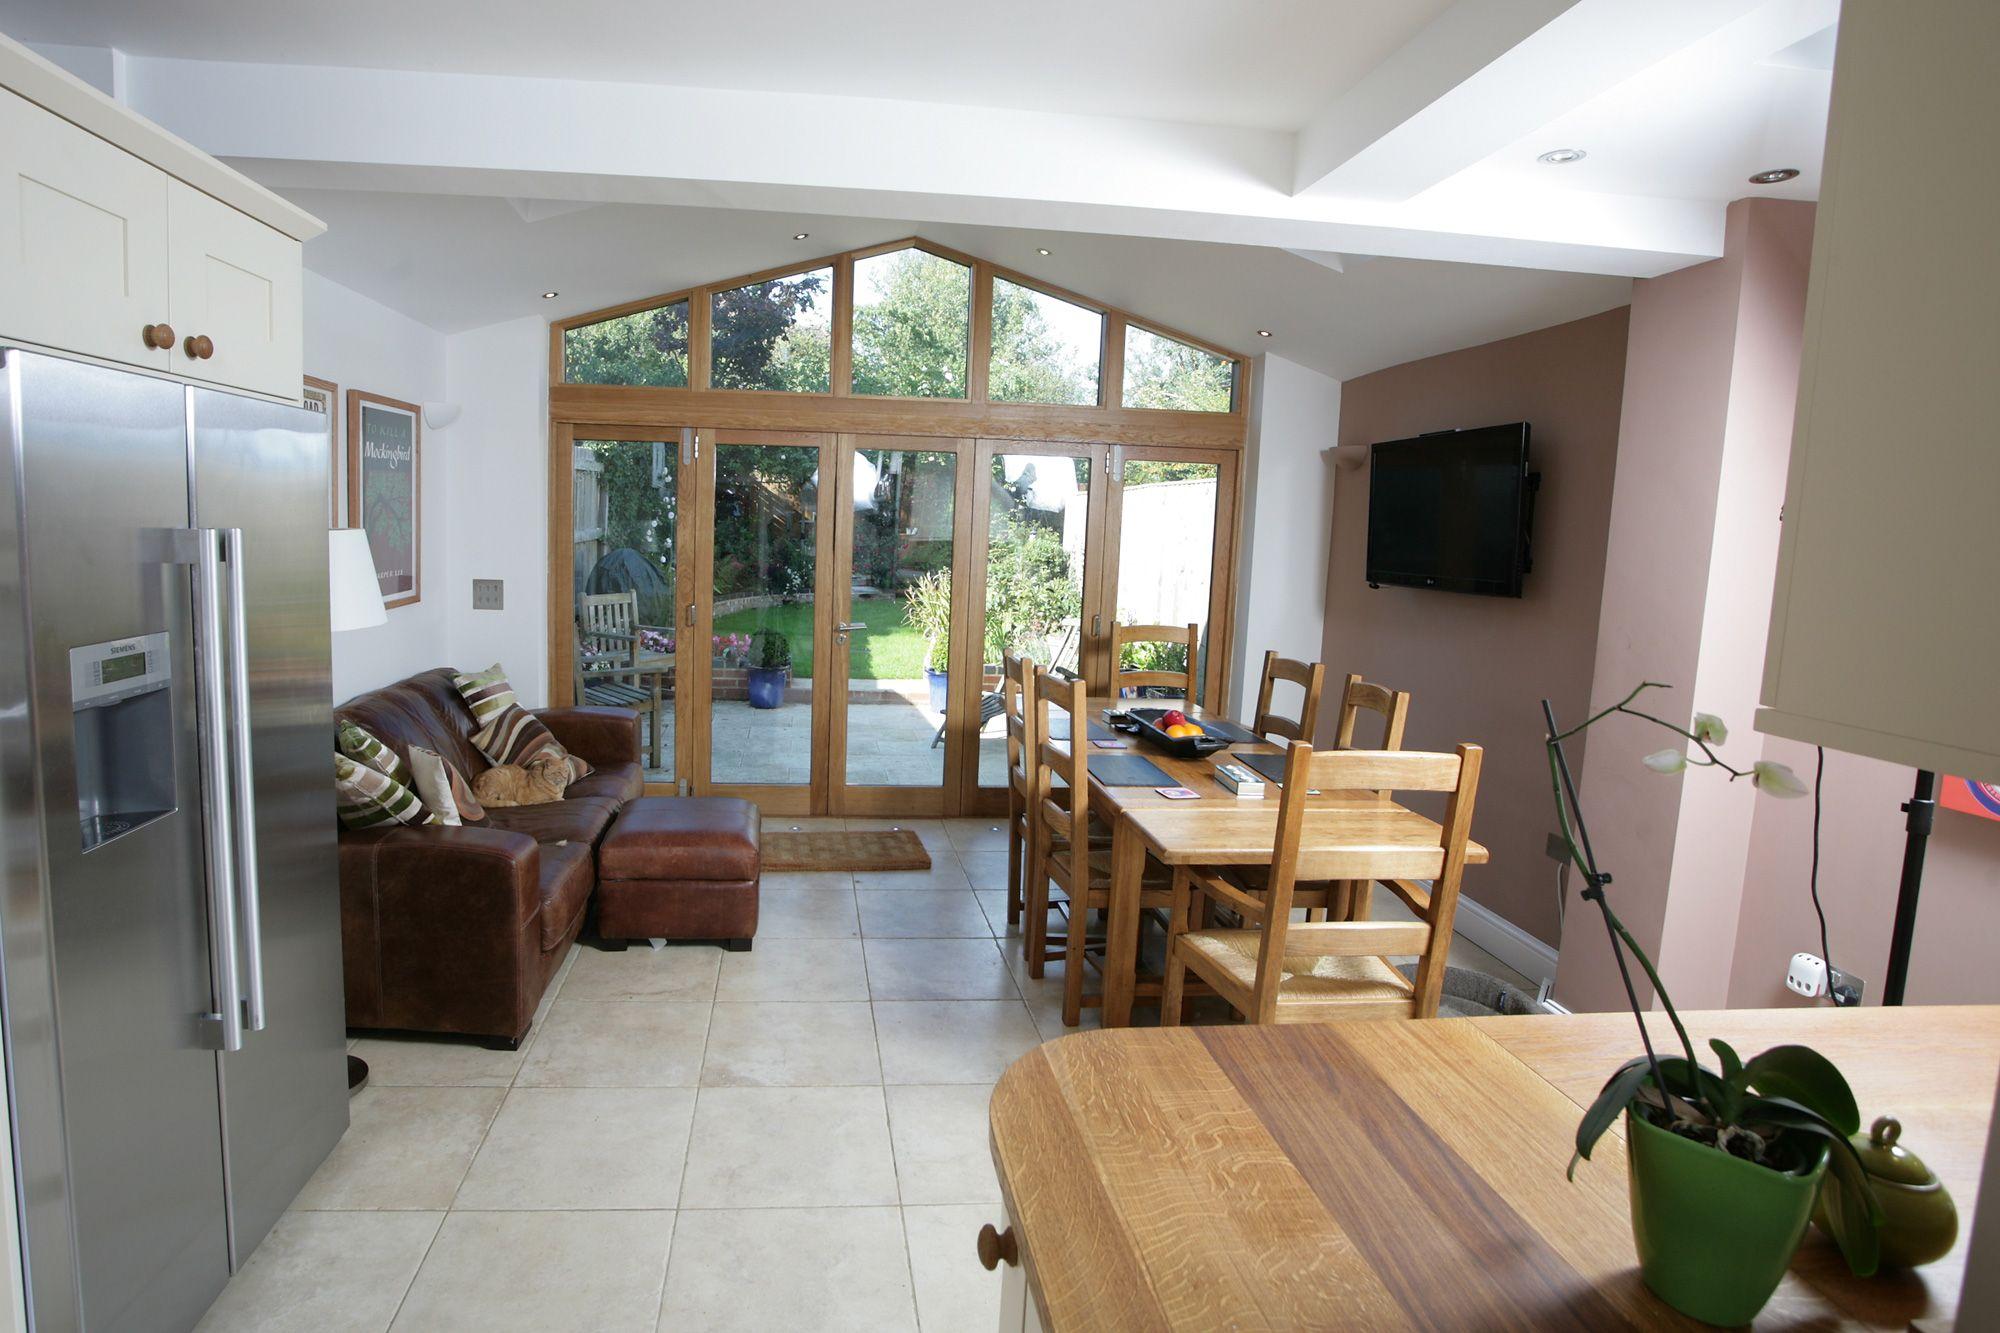 extension design ideas kitchen garden room - 9 | fantastic